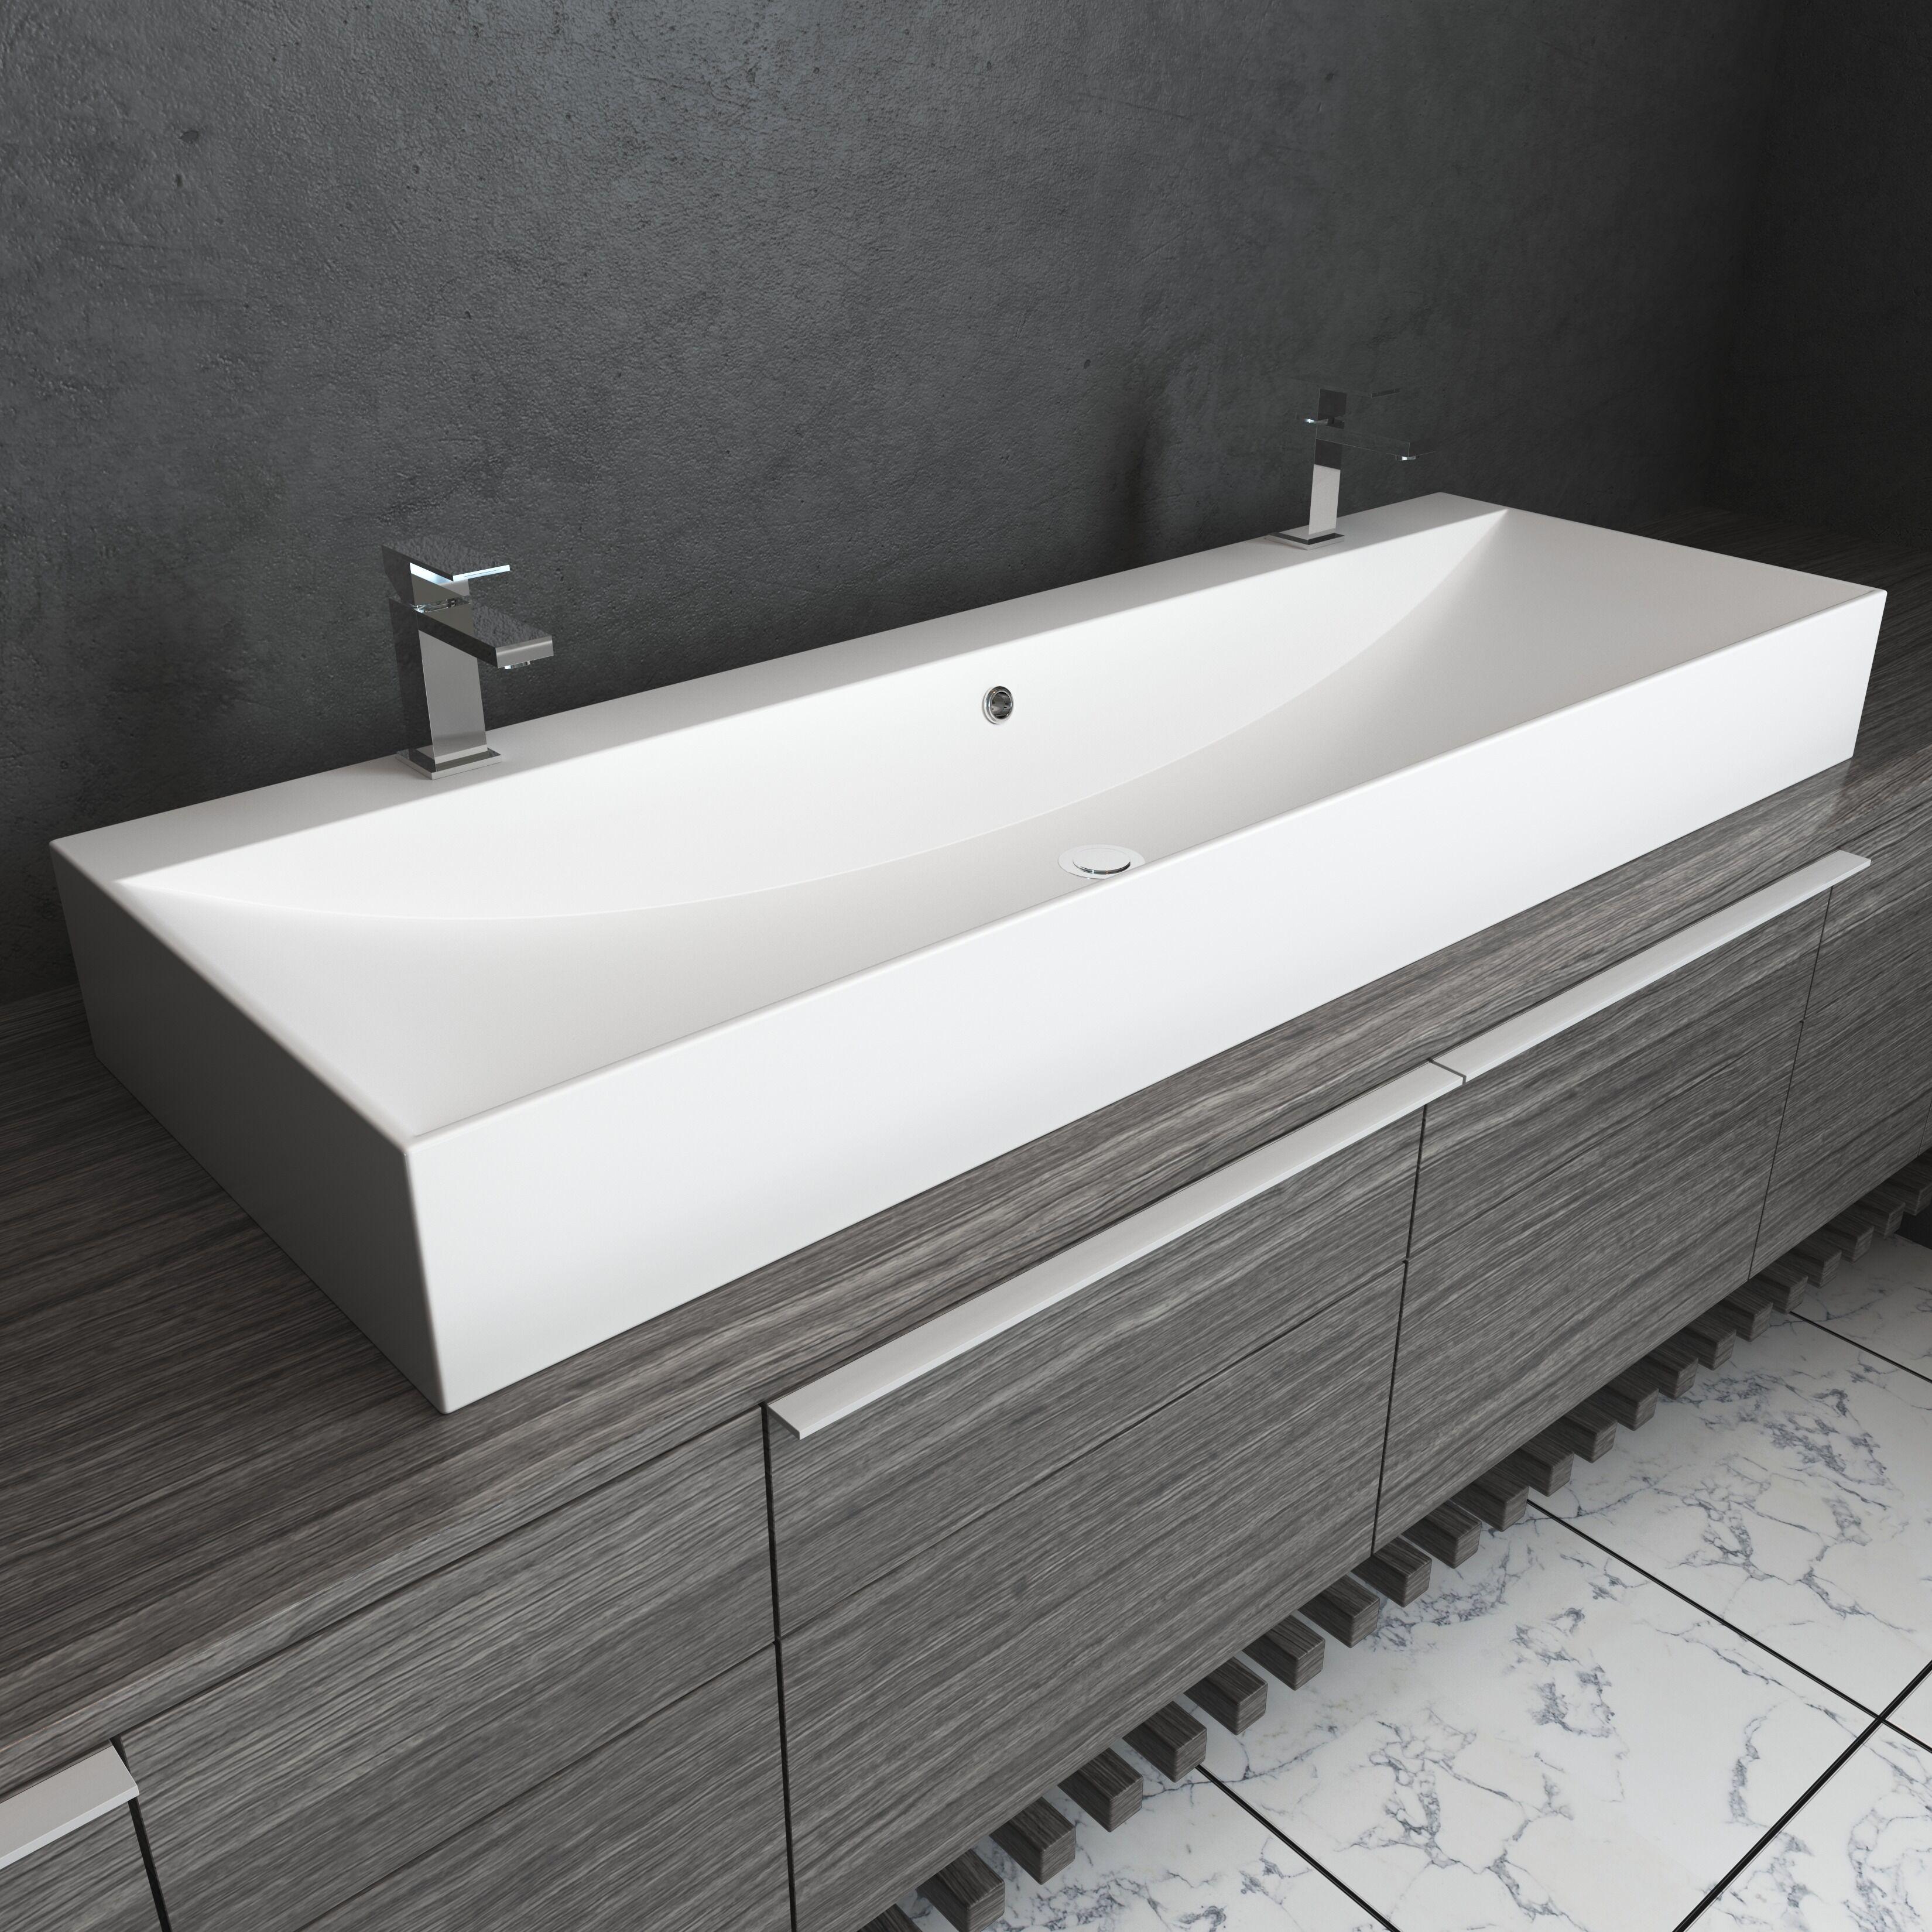 cantrio koncepts double faucet modern trough sink 46 x 12 x 5 5